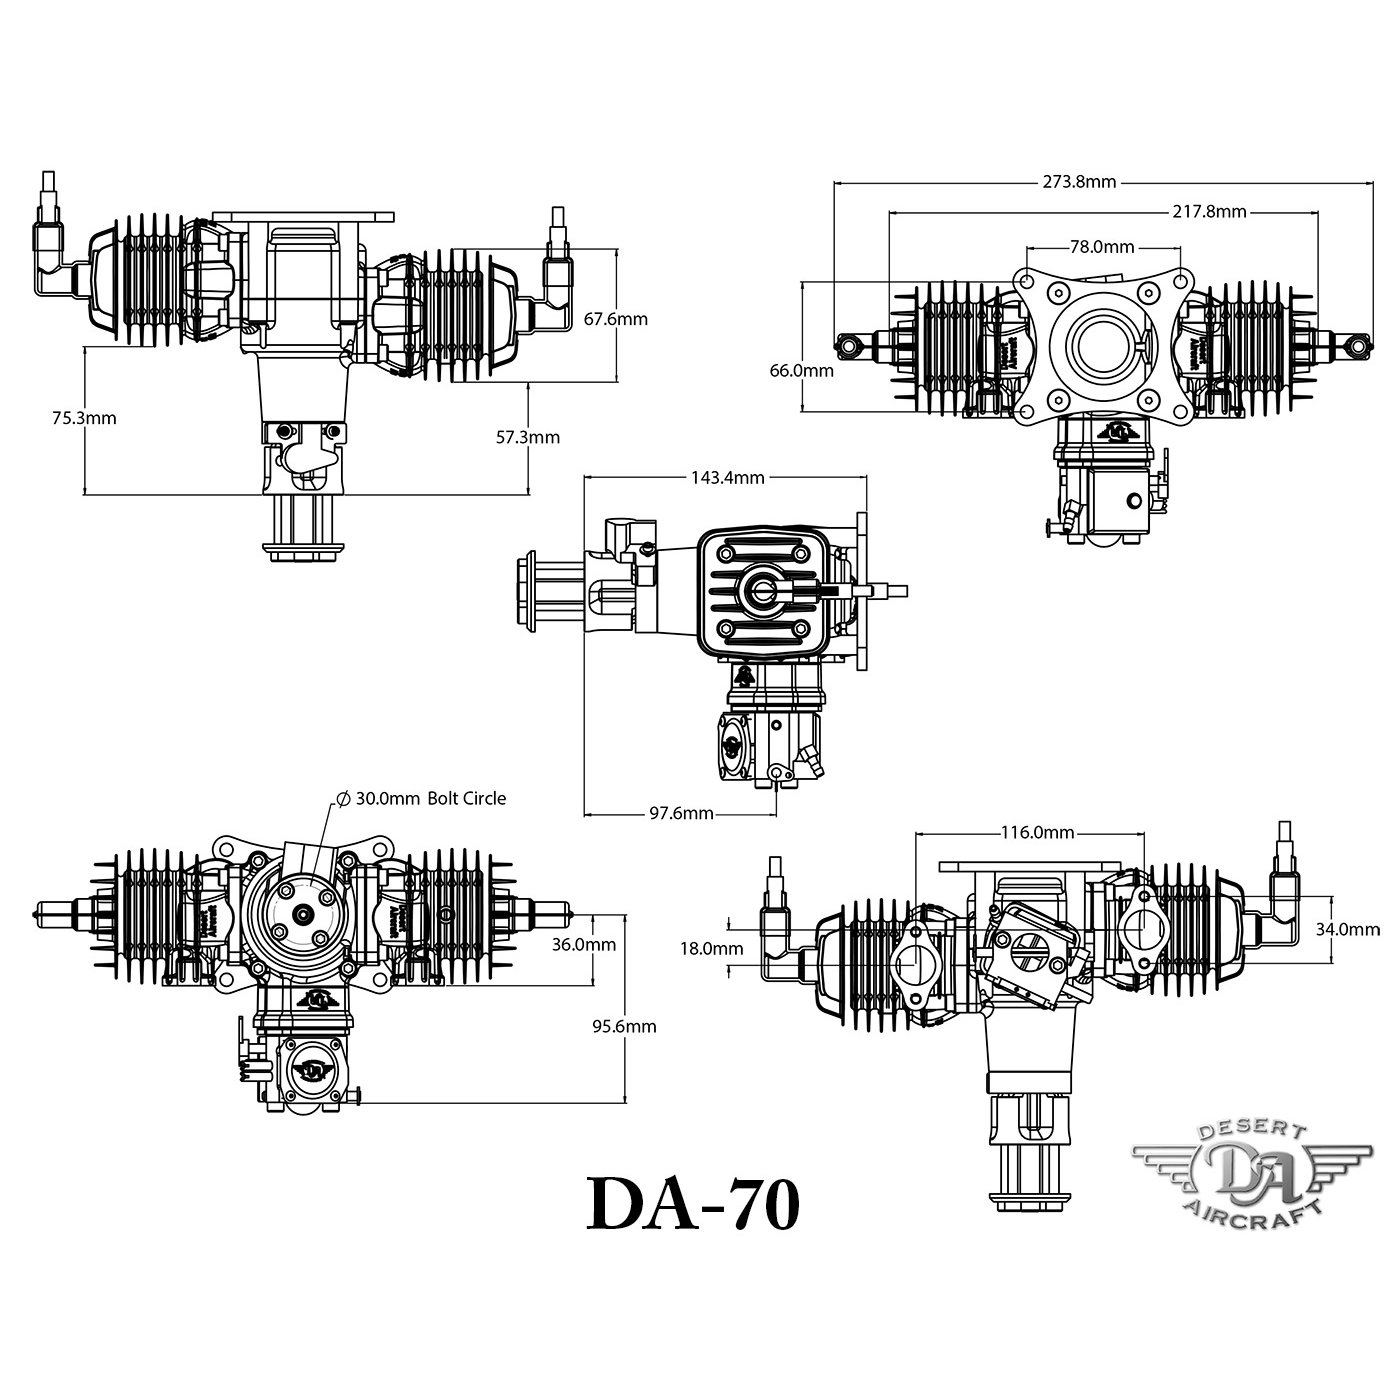 Desert Aircraft 70cc Twin Petrol Engine - DA-70 - Rs 71,512 00